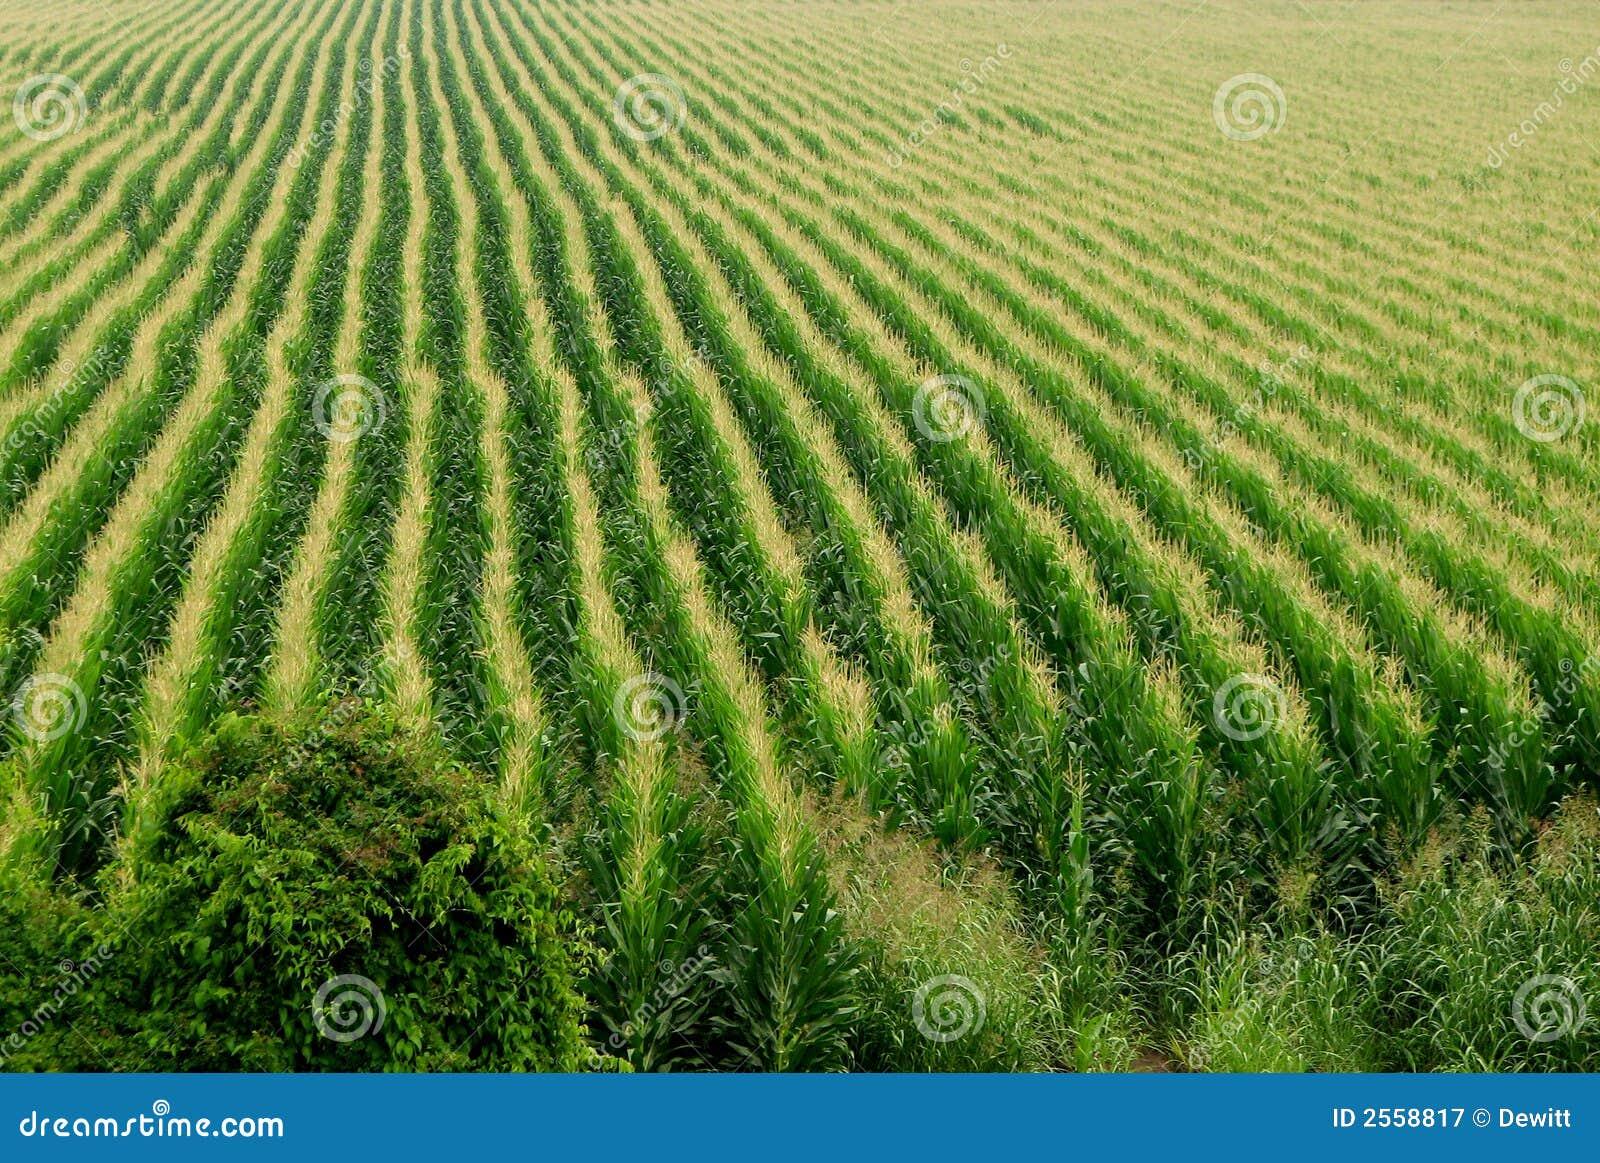 Cornfield background stock image. Image of closeup, land ...